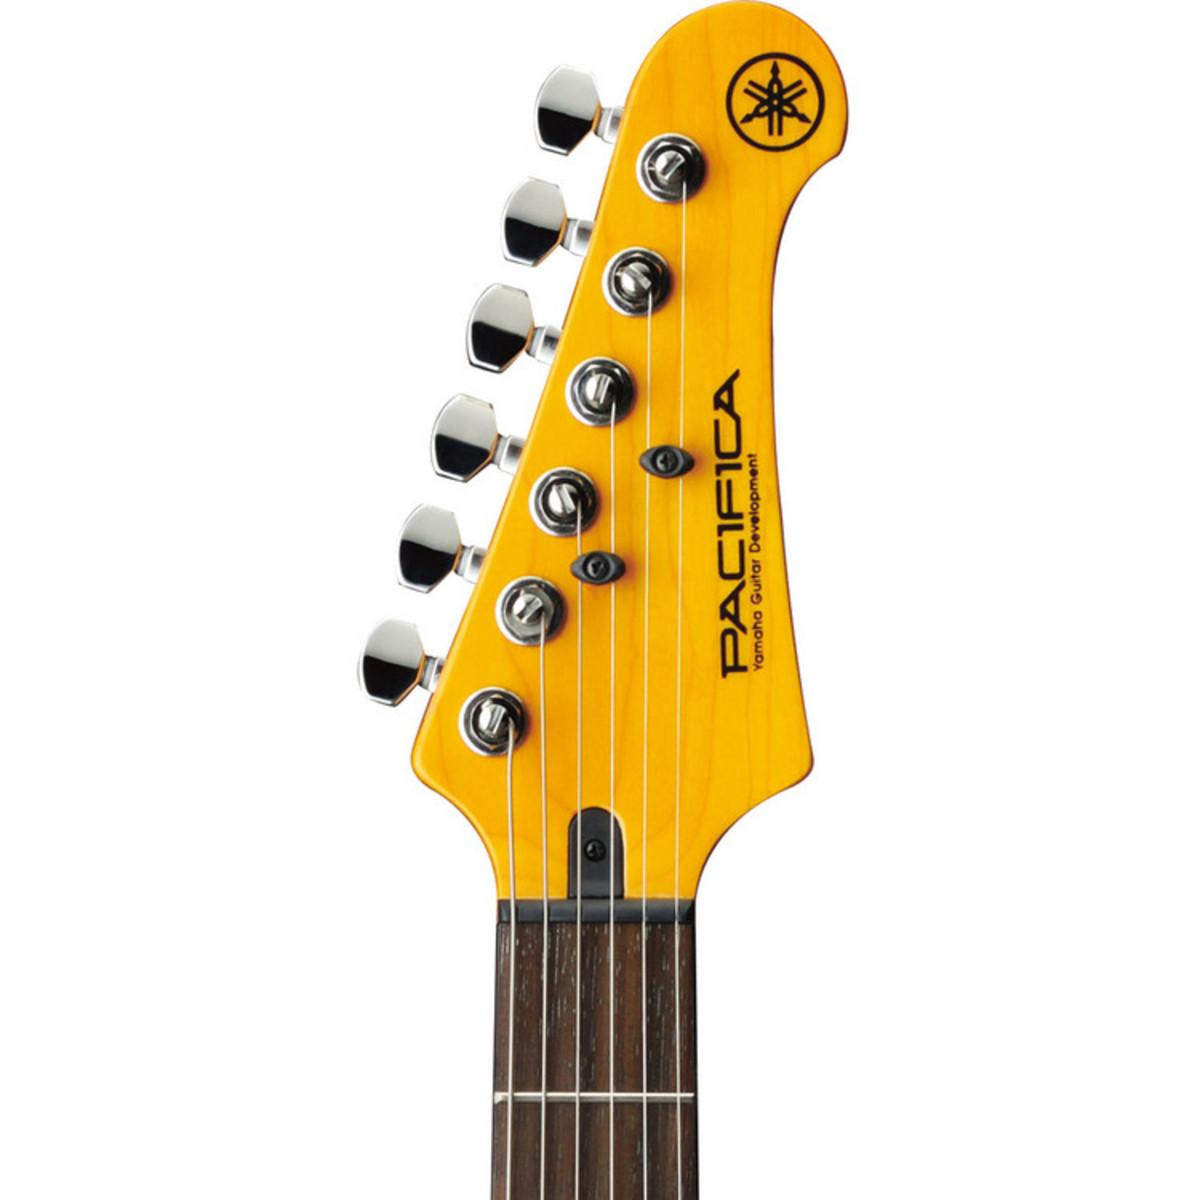 Yamaha Pacifica 510V E-Gitarre, Sonic Blue bei Gear4music